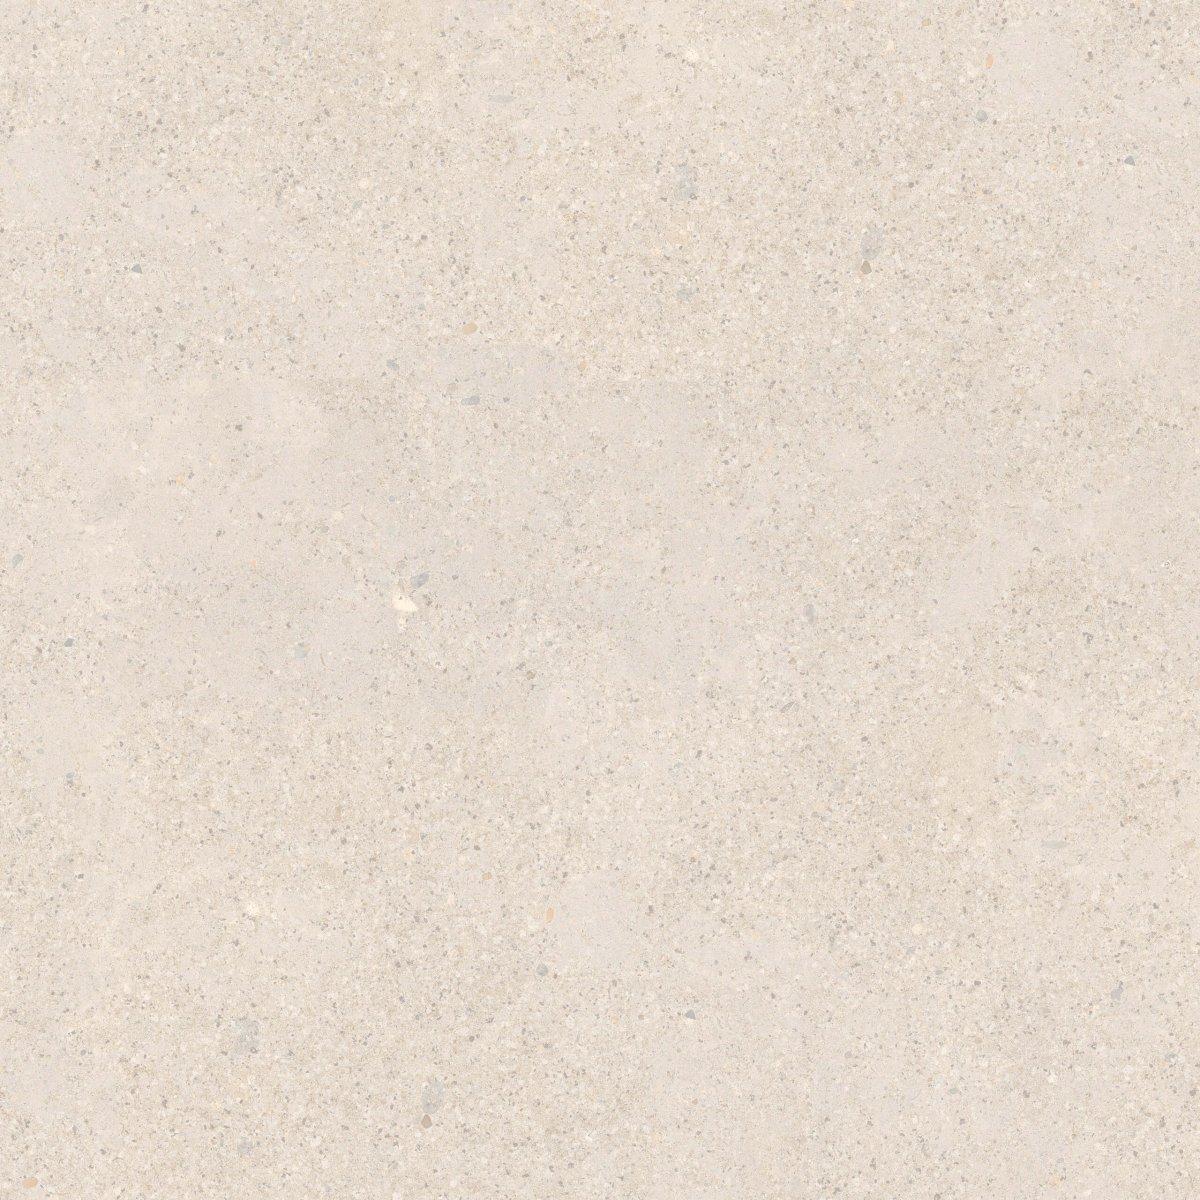 Ceramic Industries Nostalgia White Eco 600x600mm_Stiles_Product_Image2